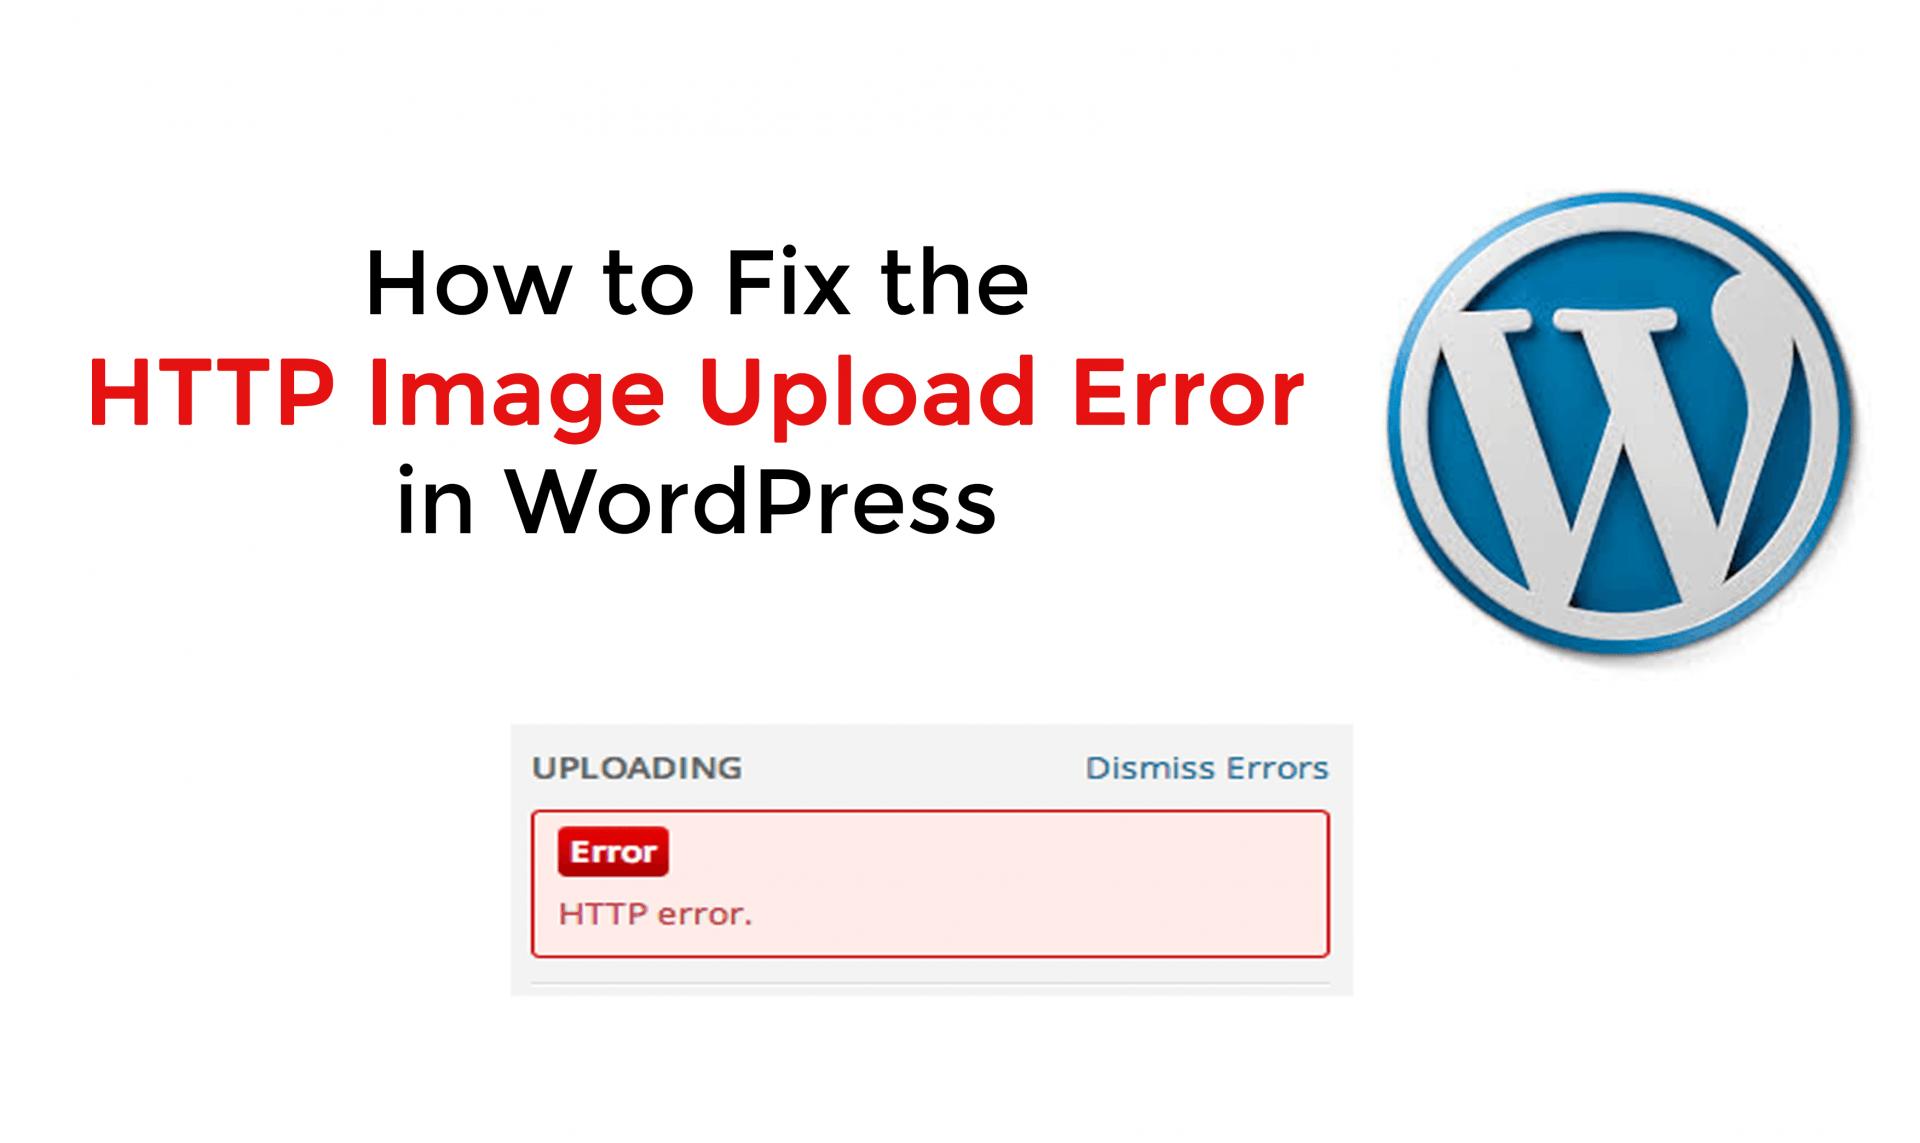 http error - رفع خطای HTTP هنگام آپلود در وردپرس